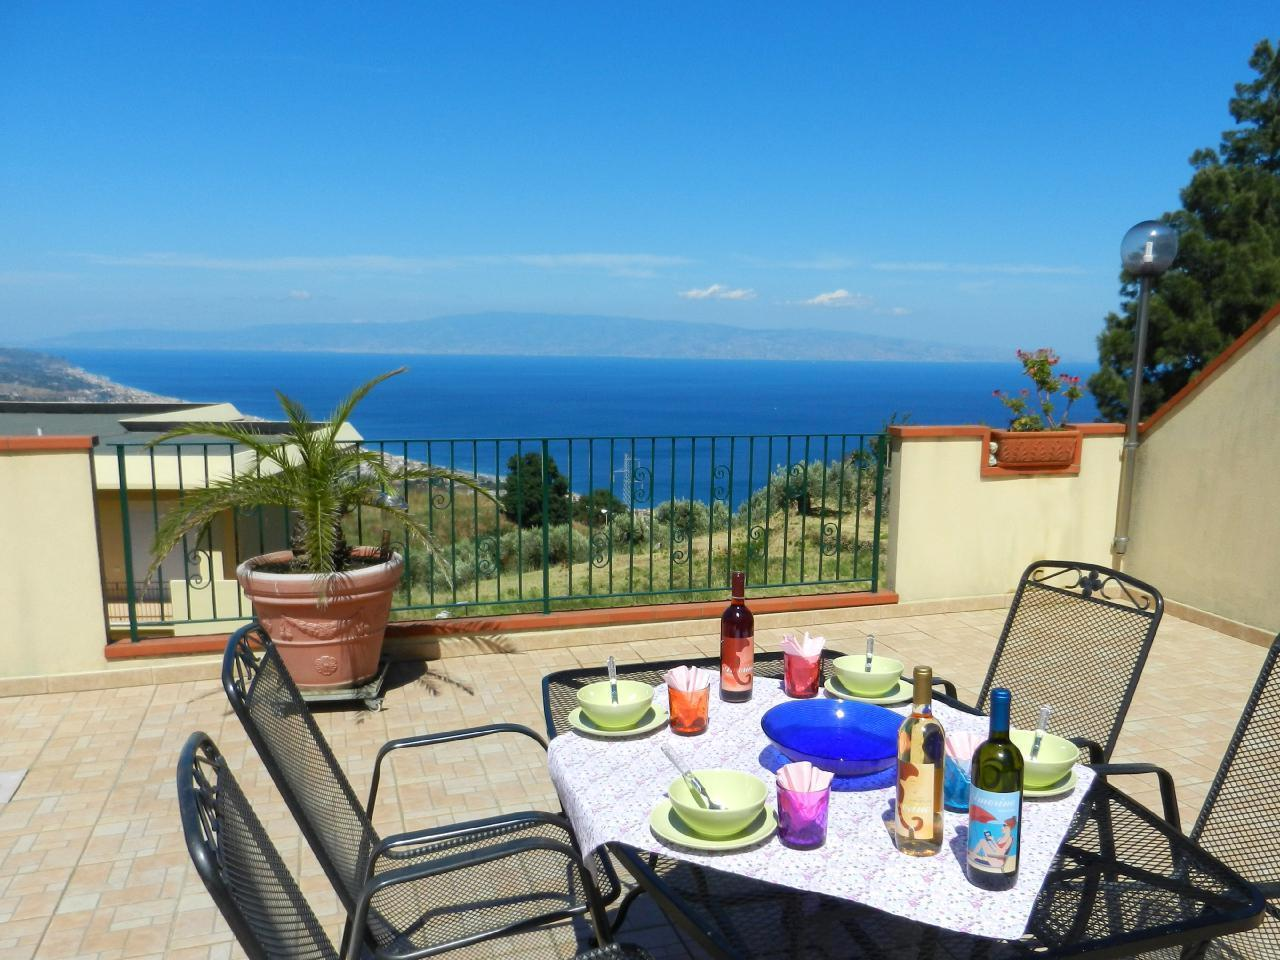 Holiday apartment Fewo mit Balkon im Panorama-Dorf bei Taormina (737398), Forza d'Agro', Messina, Sicily, Italy, picture 11